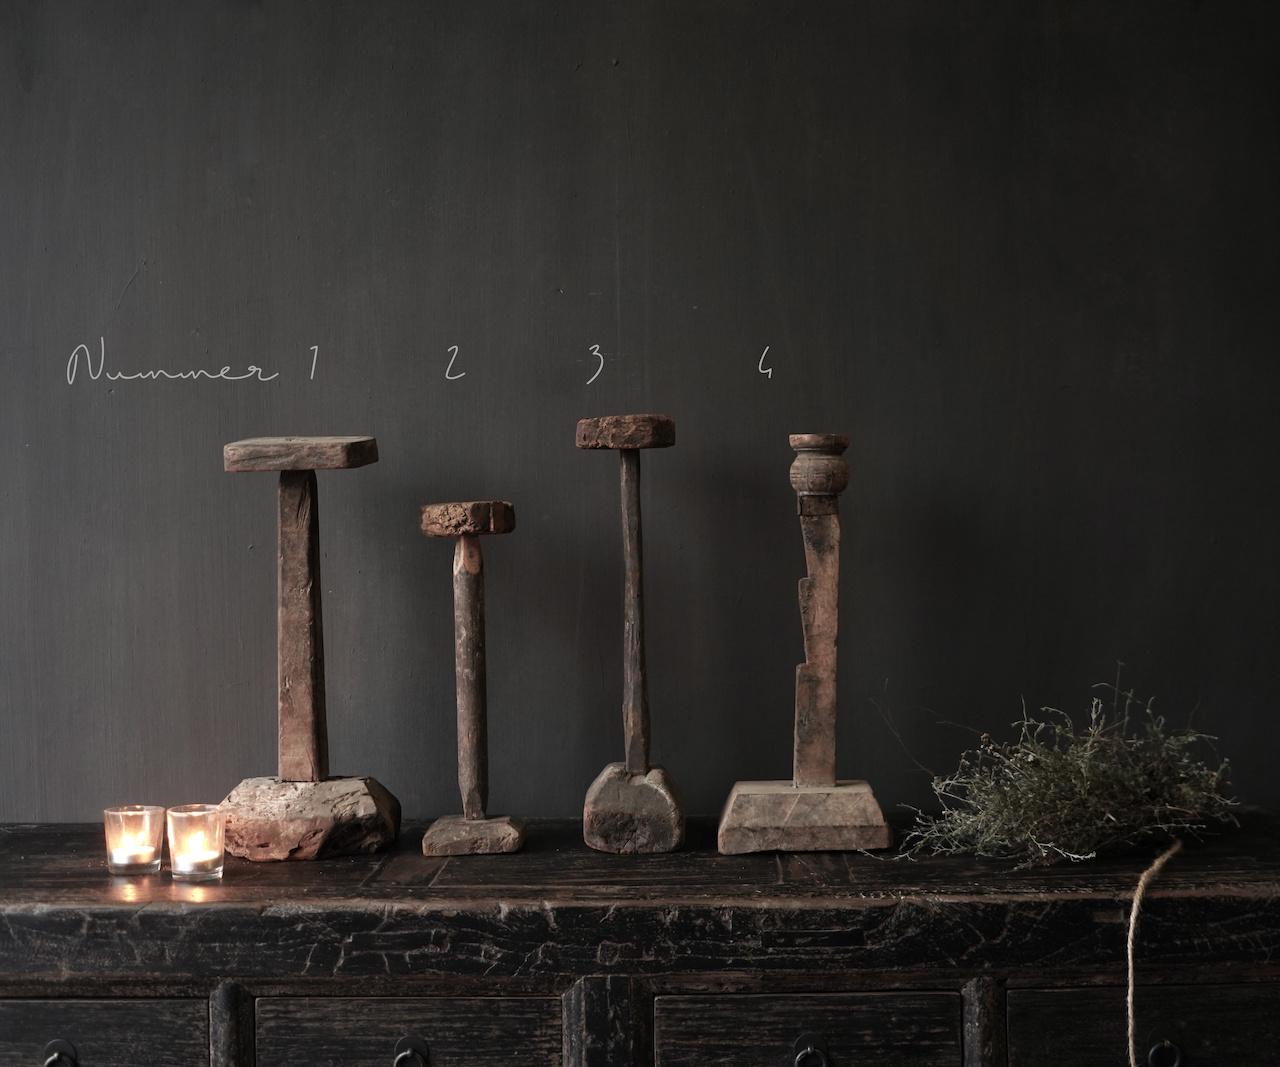 Wooden Stamper candlestick-2